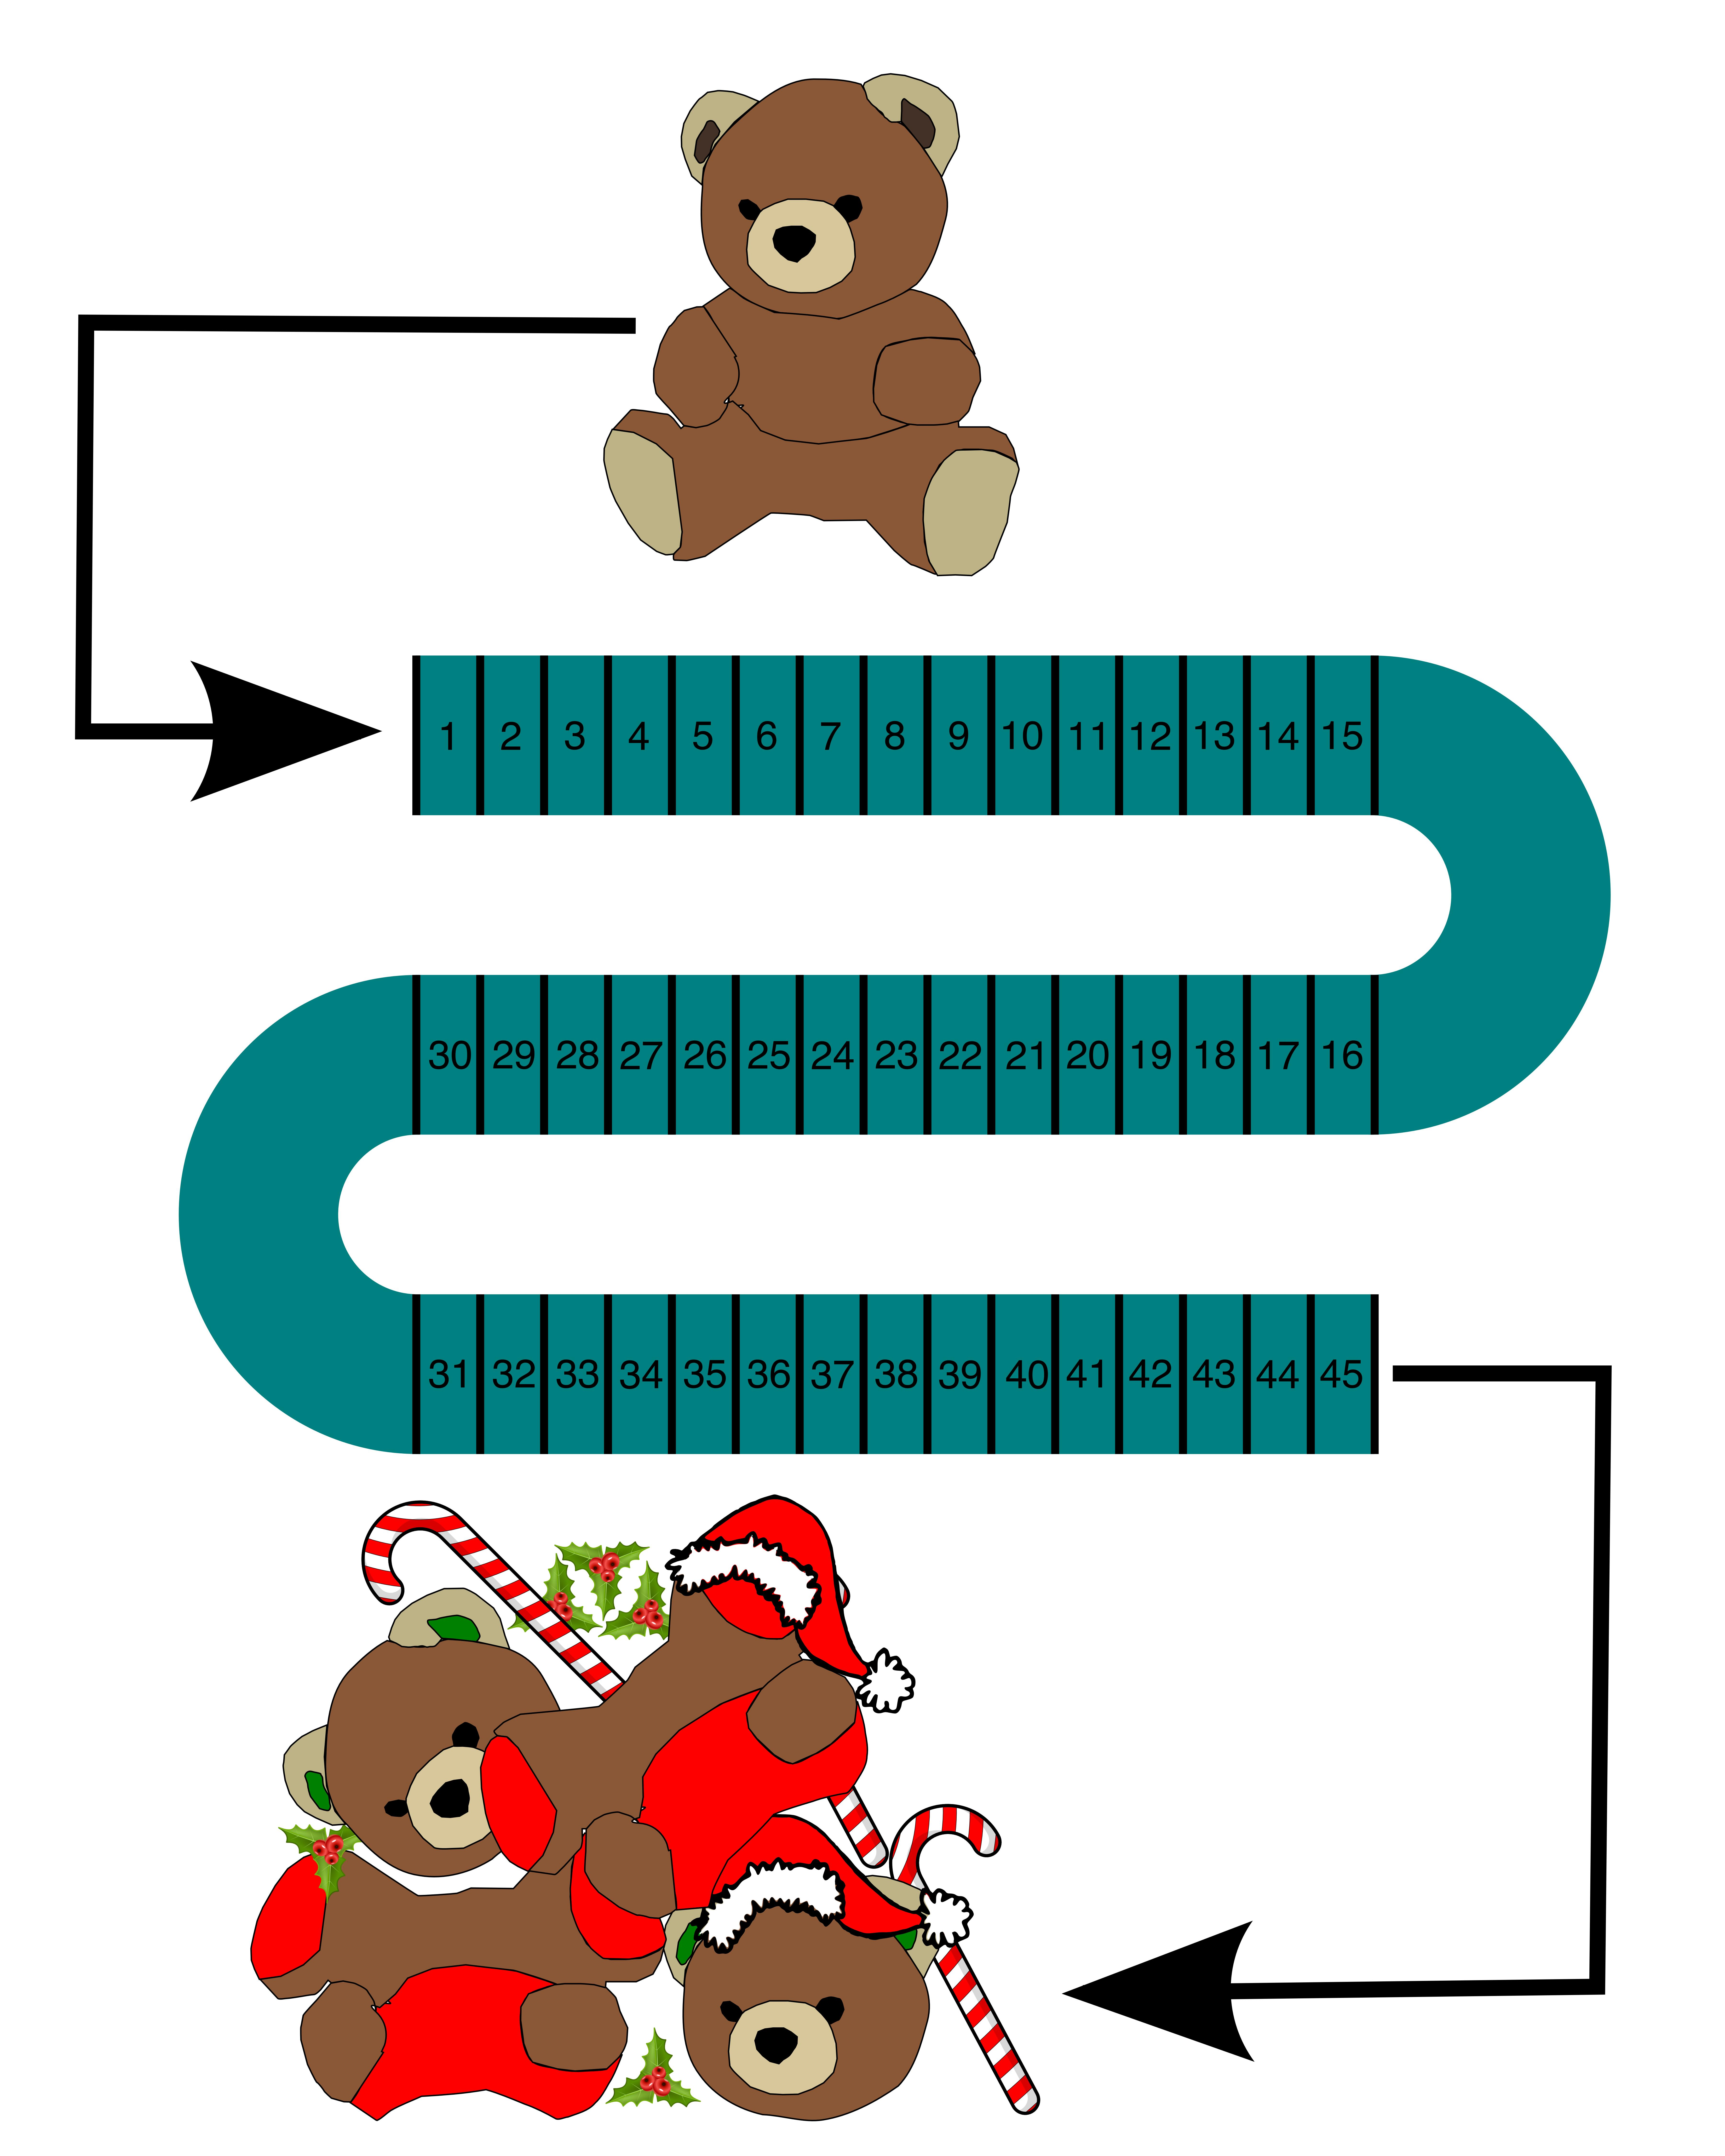 Teddy Bear Assembly Line - malfunction